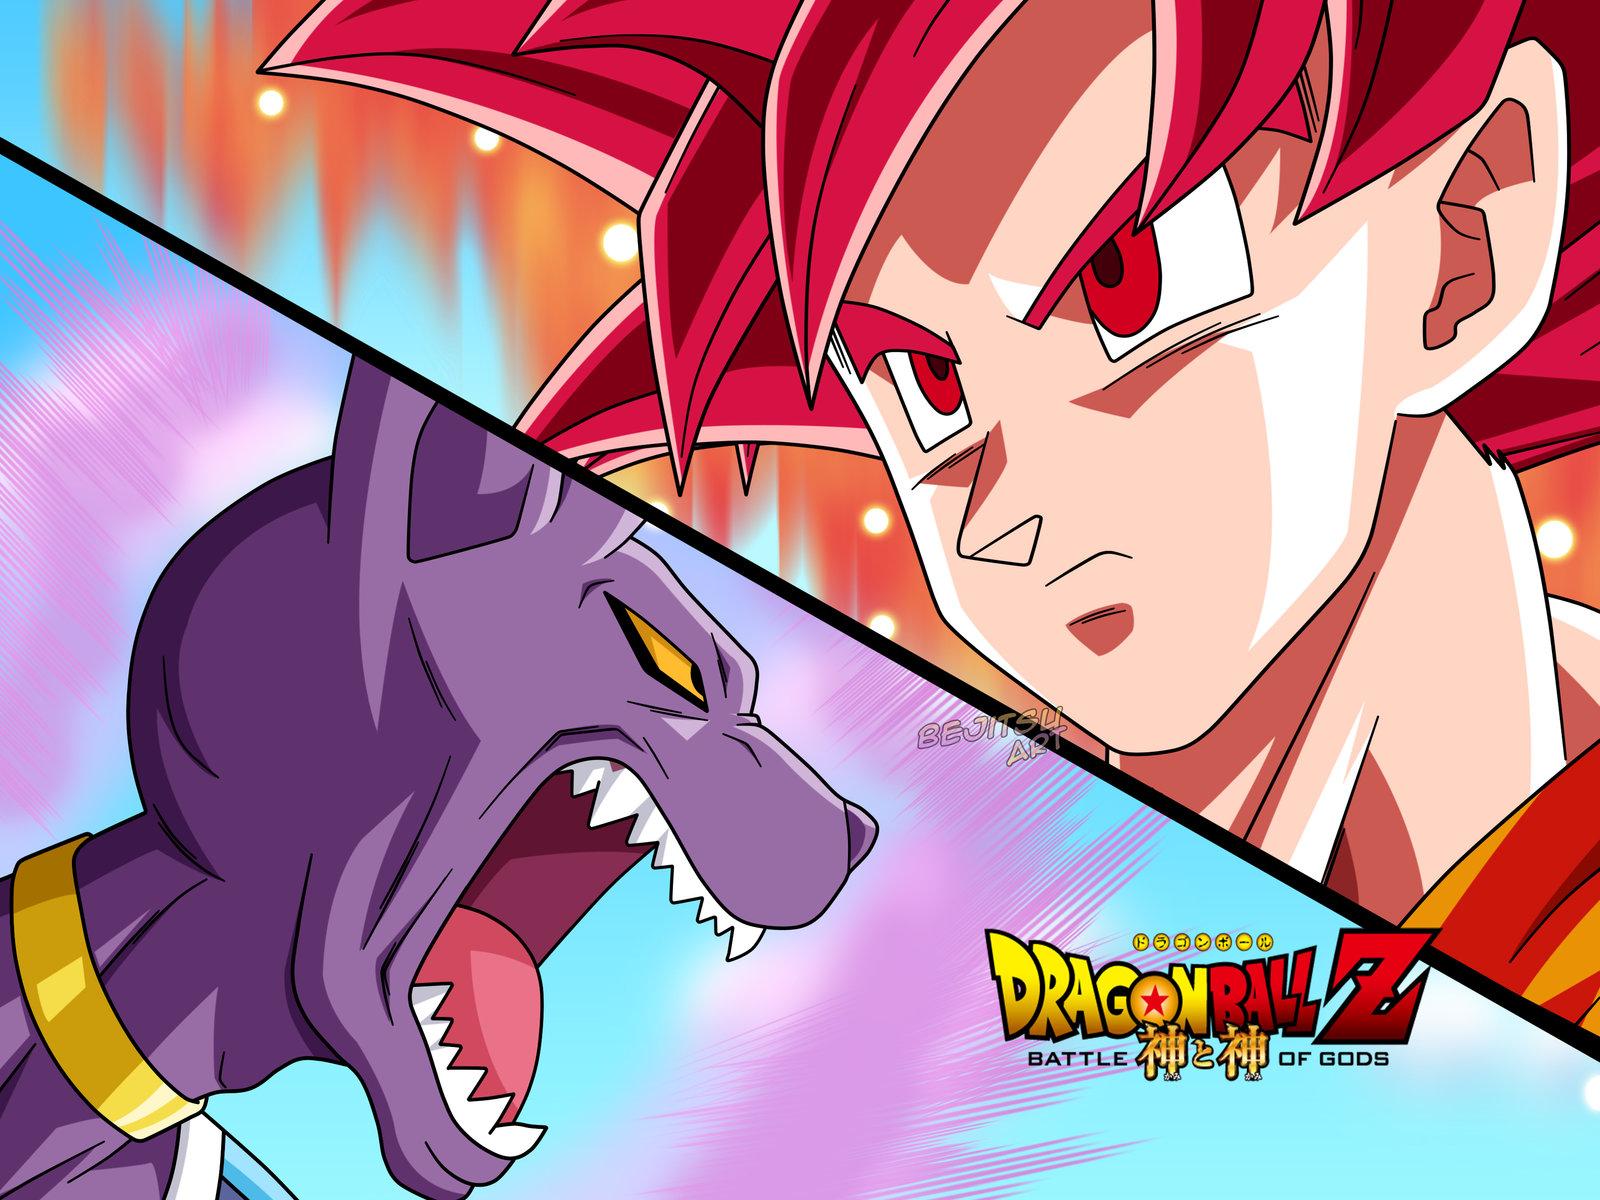 *Goku V/s Bills*